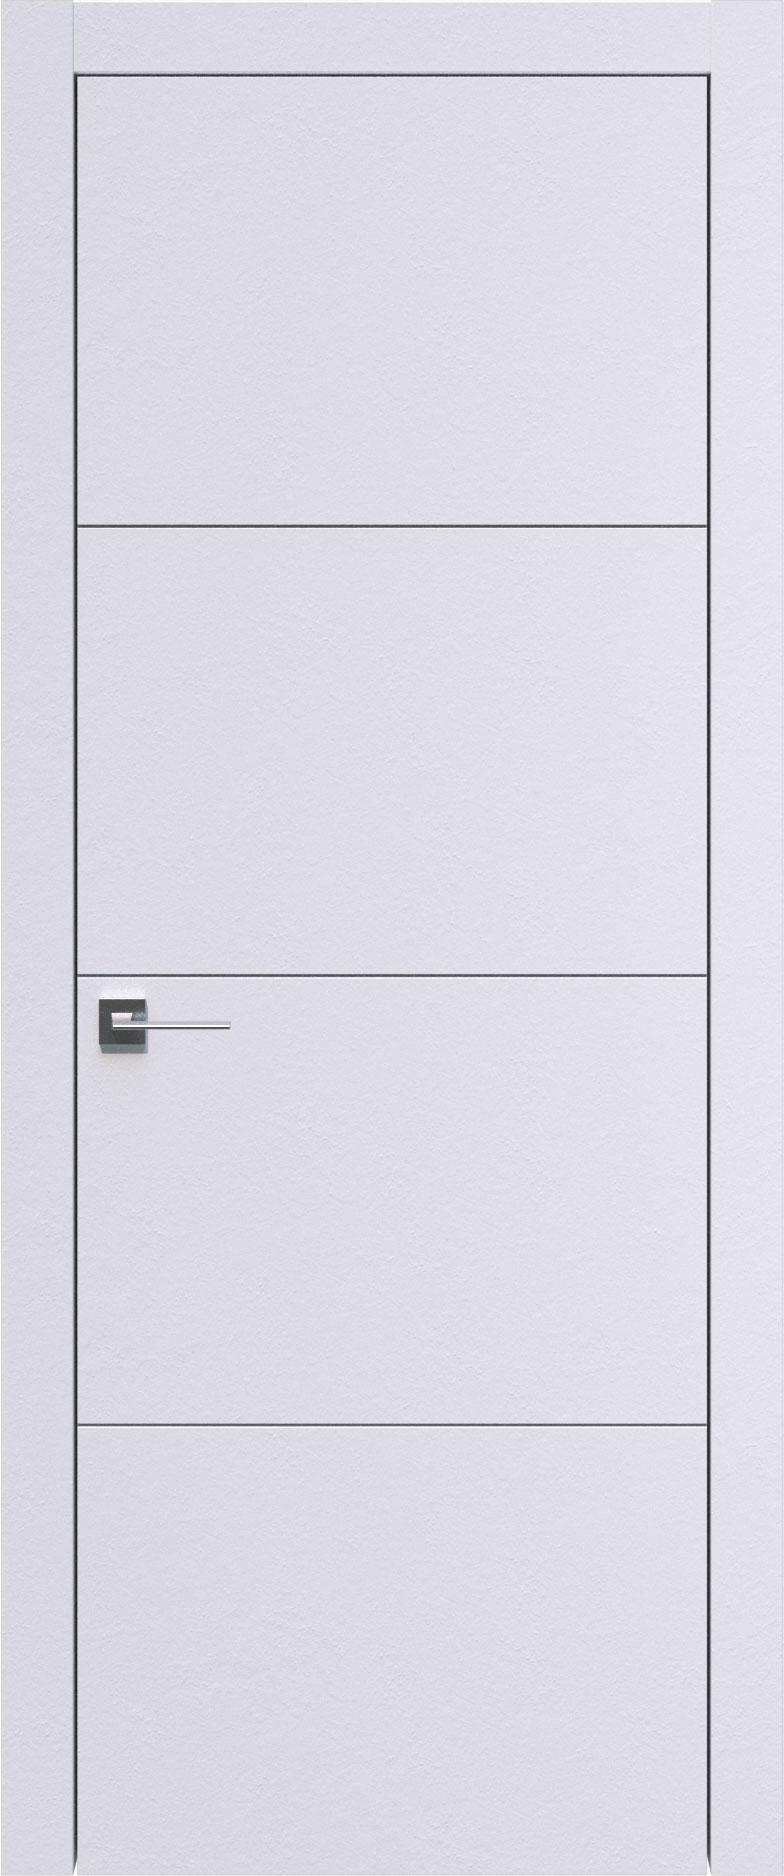 Tivoli Г-2 цвет - Арктик белый Без стекла (ДГ)